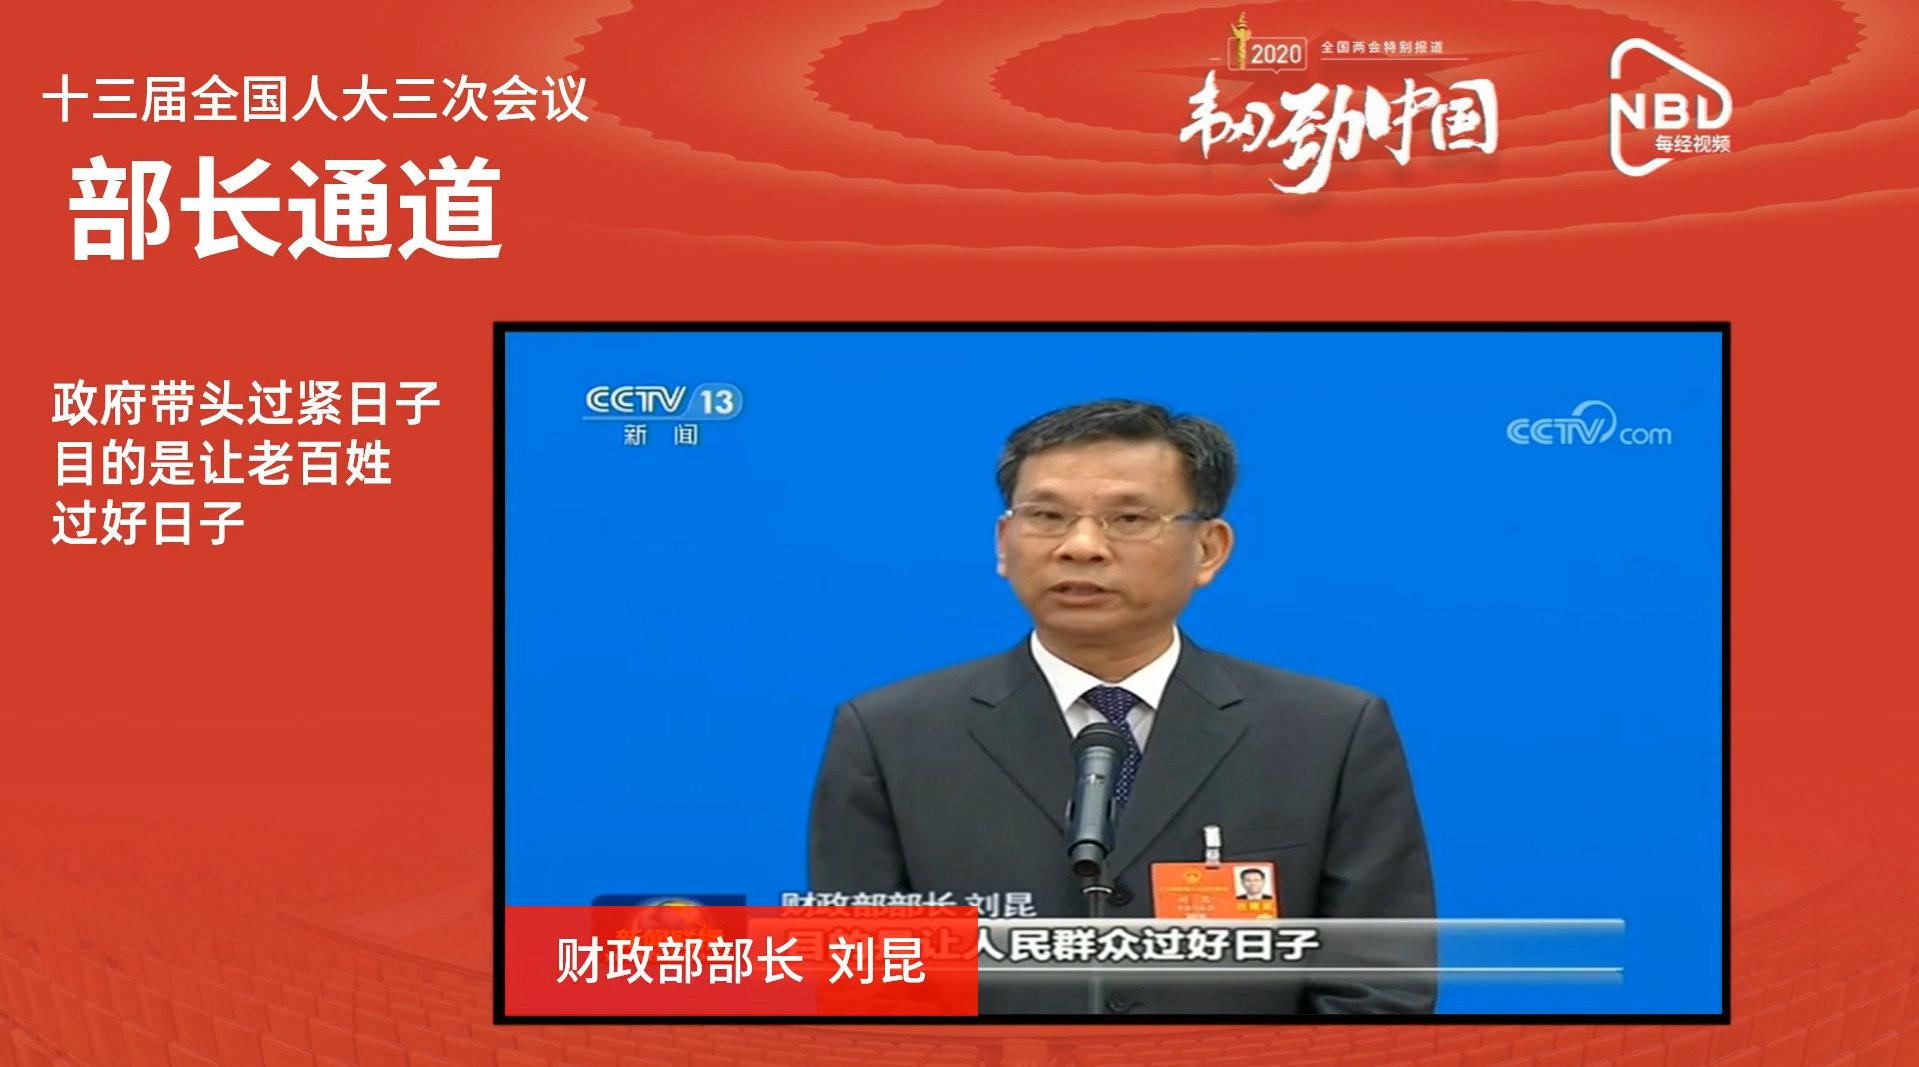 AI主播看两会 | 财政部部长刘昆:政府带头过紧日子……